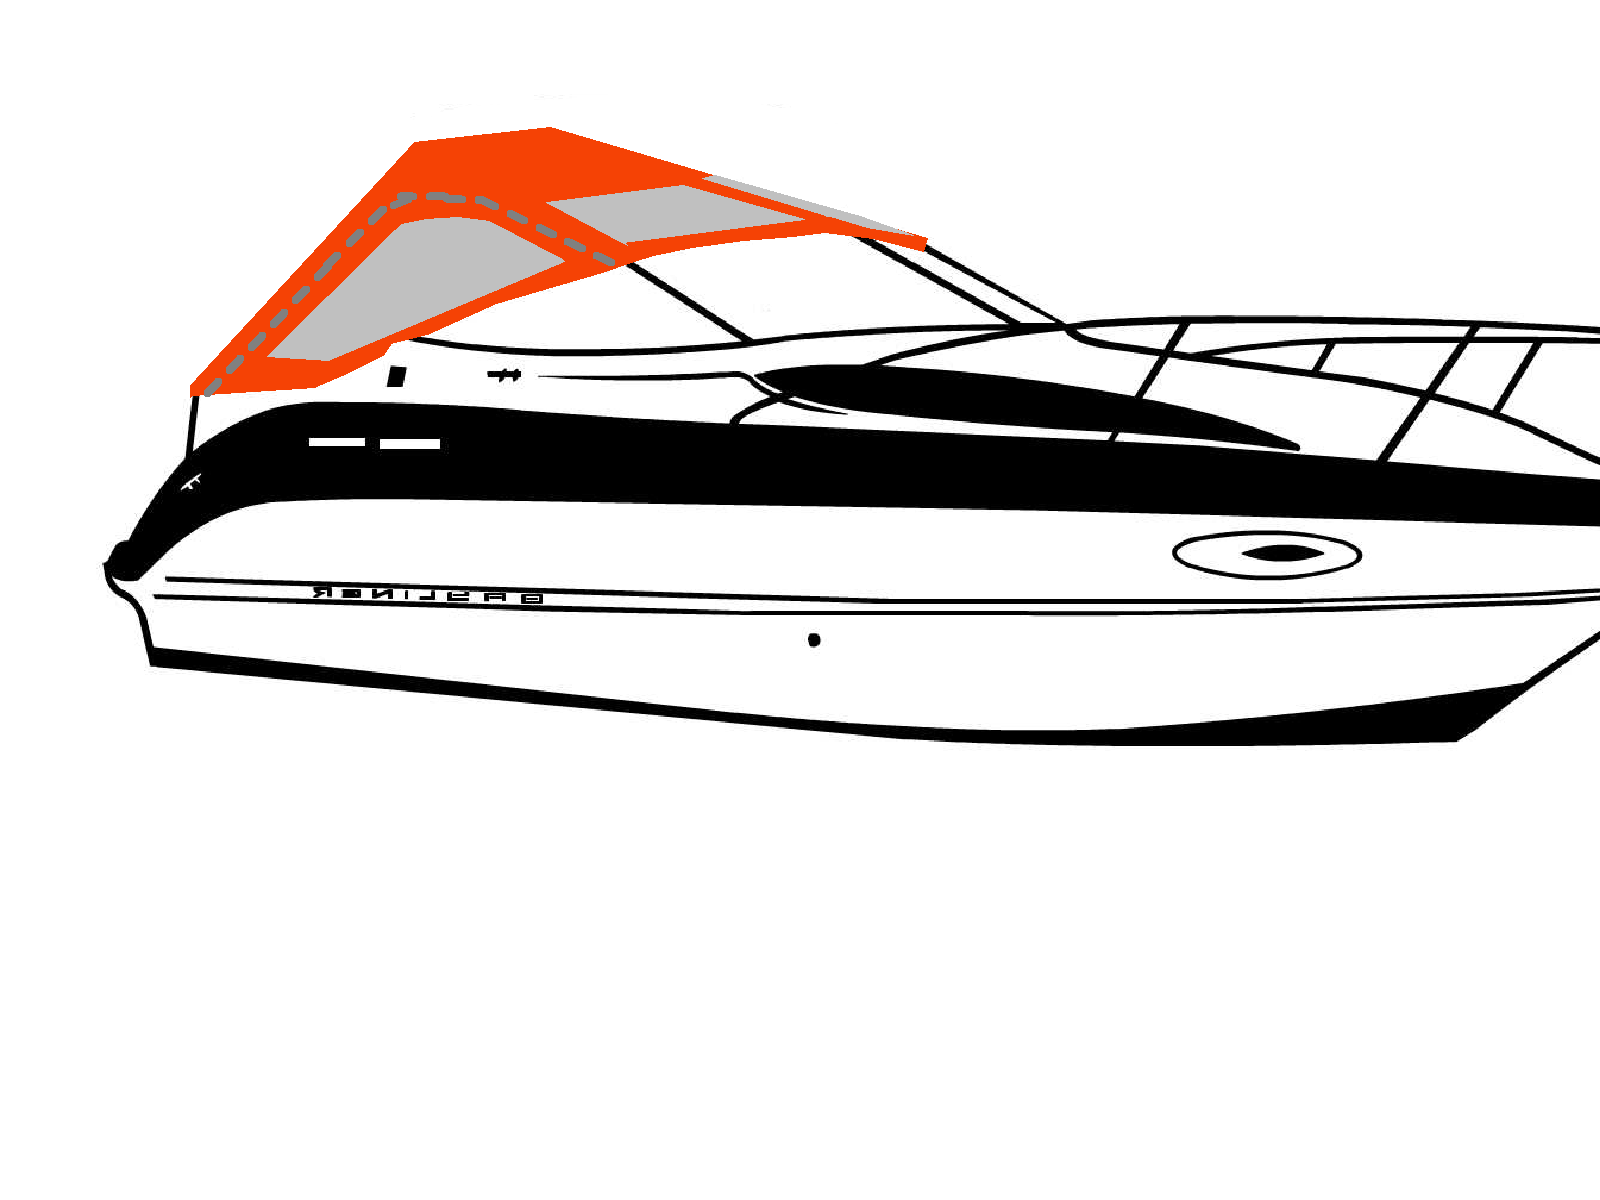 03 04 Typ R Motorboot Sportverdeck.PNG